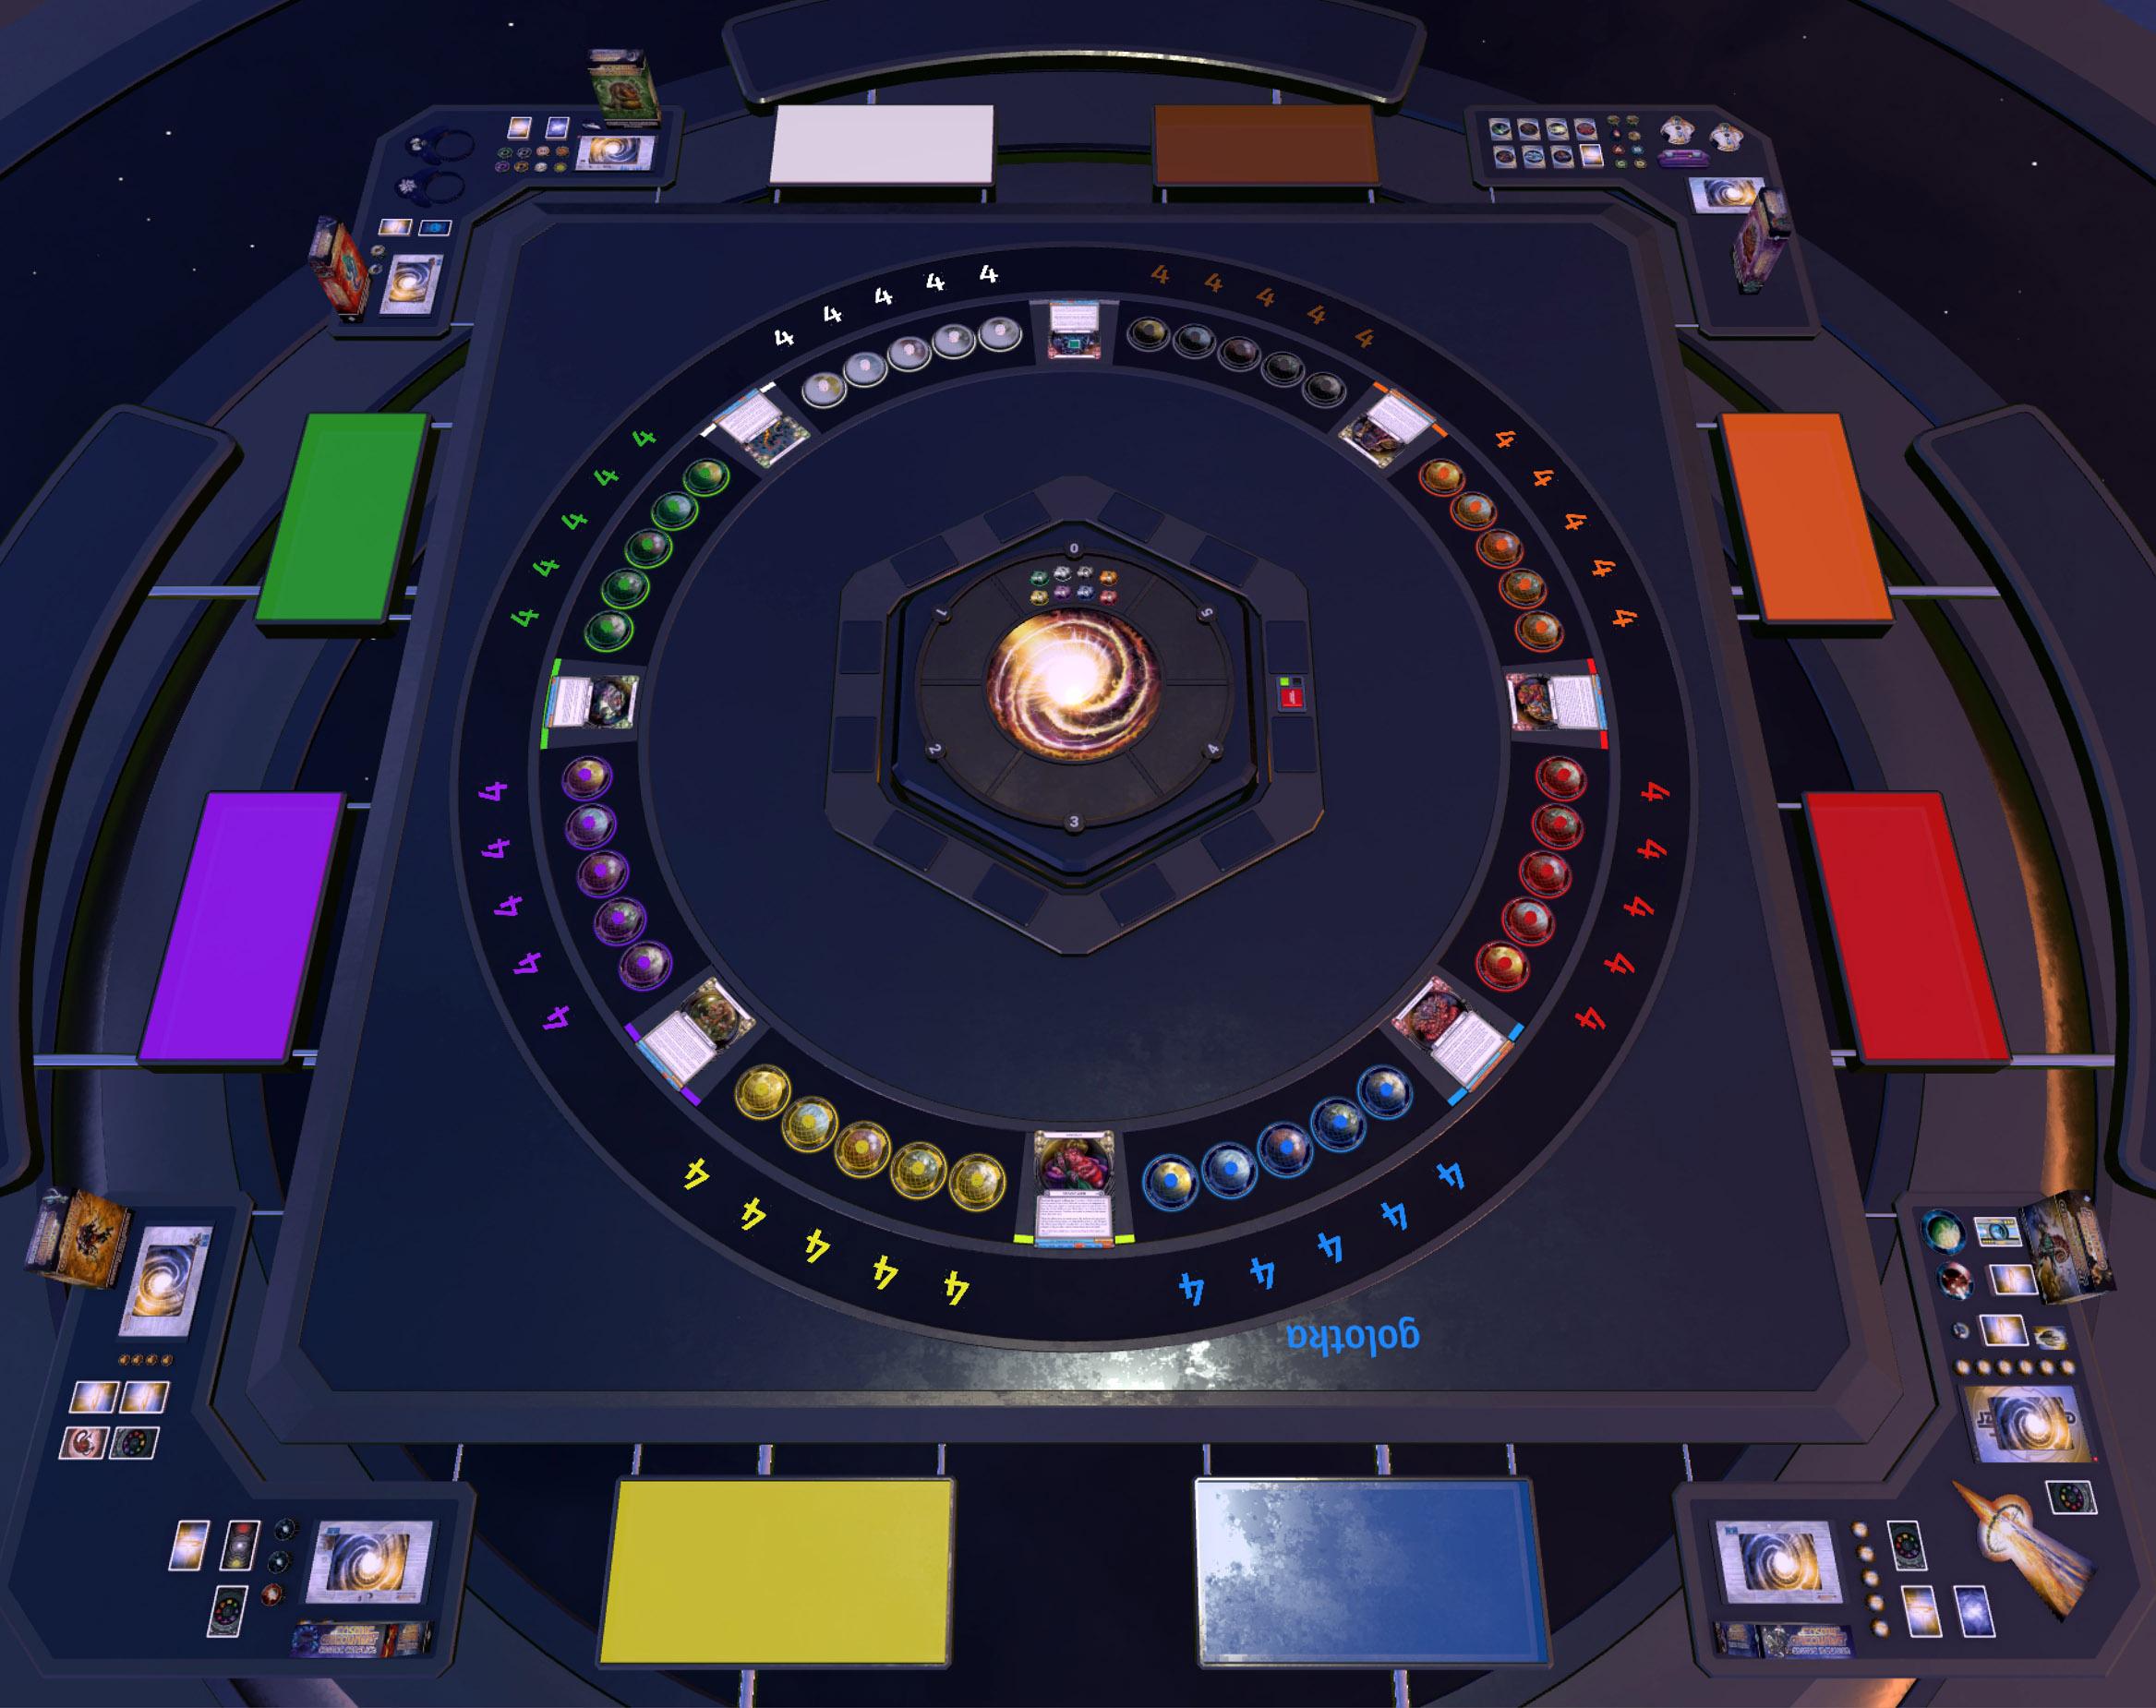 playnow-gamesetup2.jpg